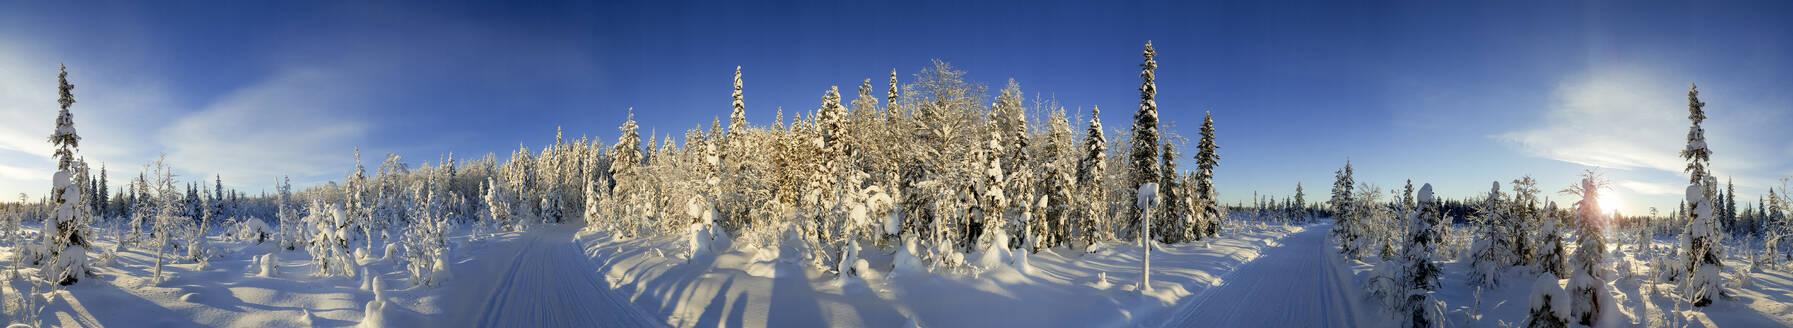 Snow covered trees and track, Kuusamo, Lapland, Finland, Europe - RHPLF12542